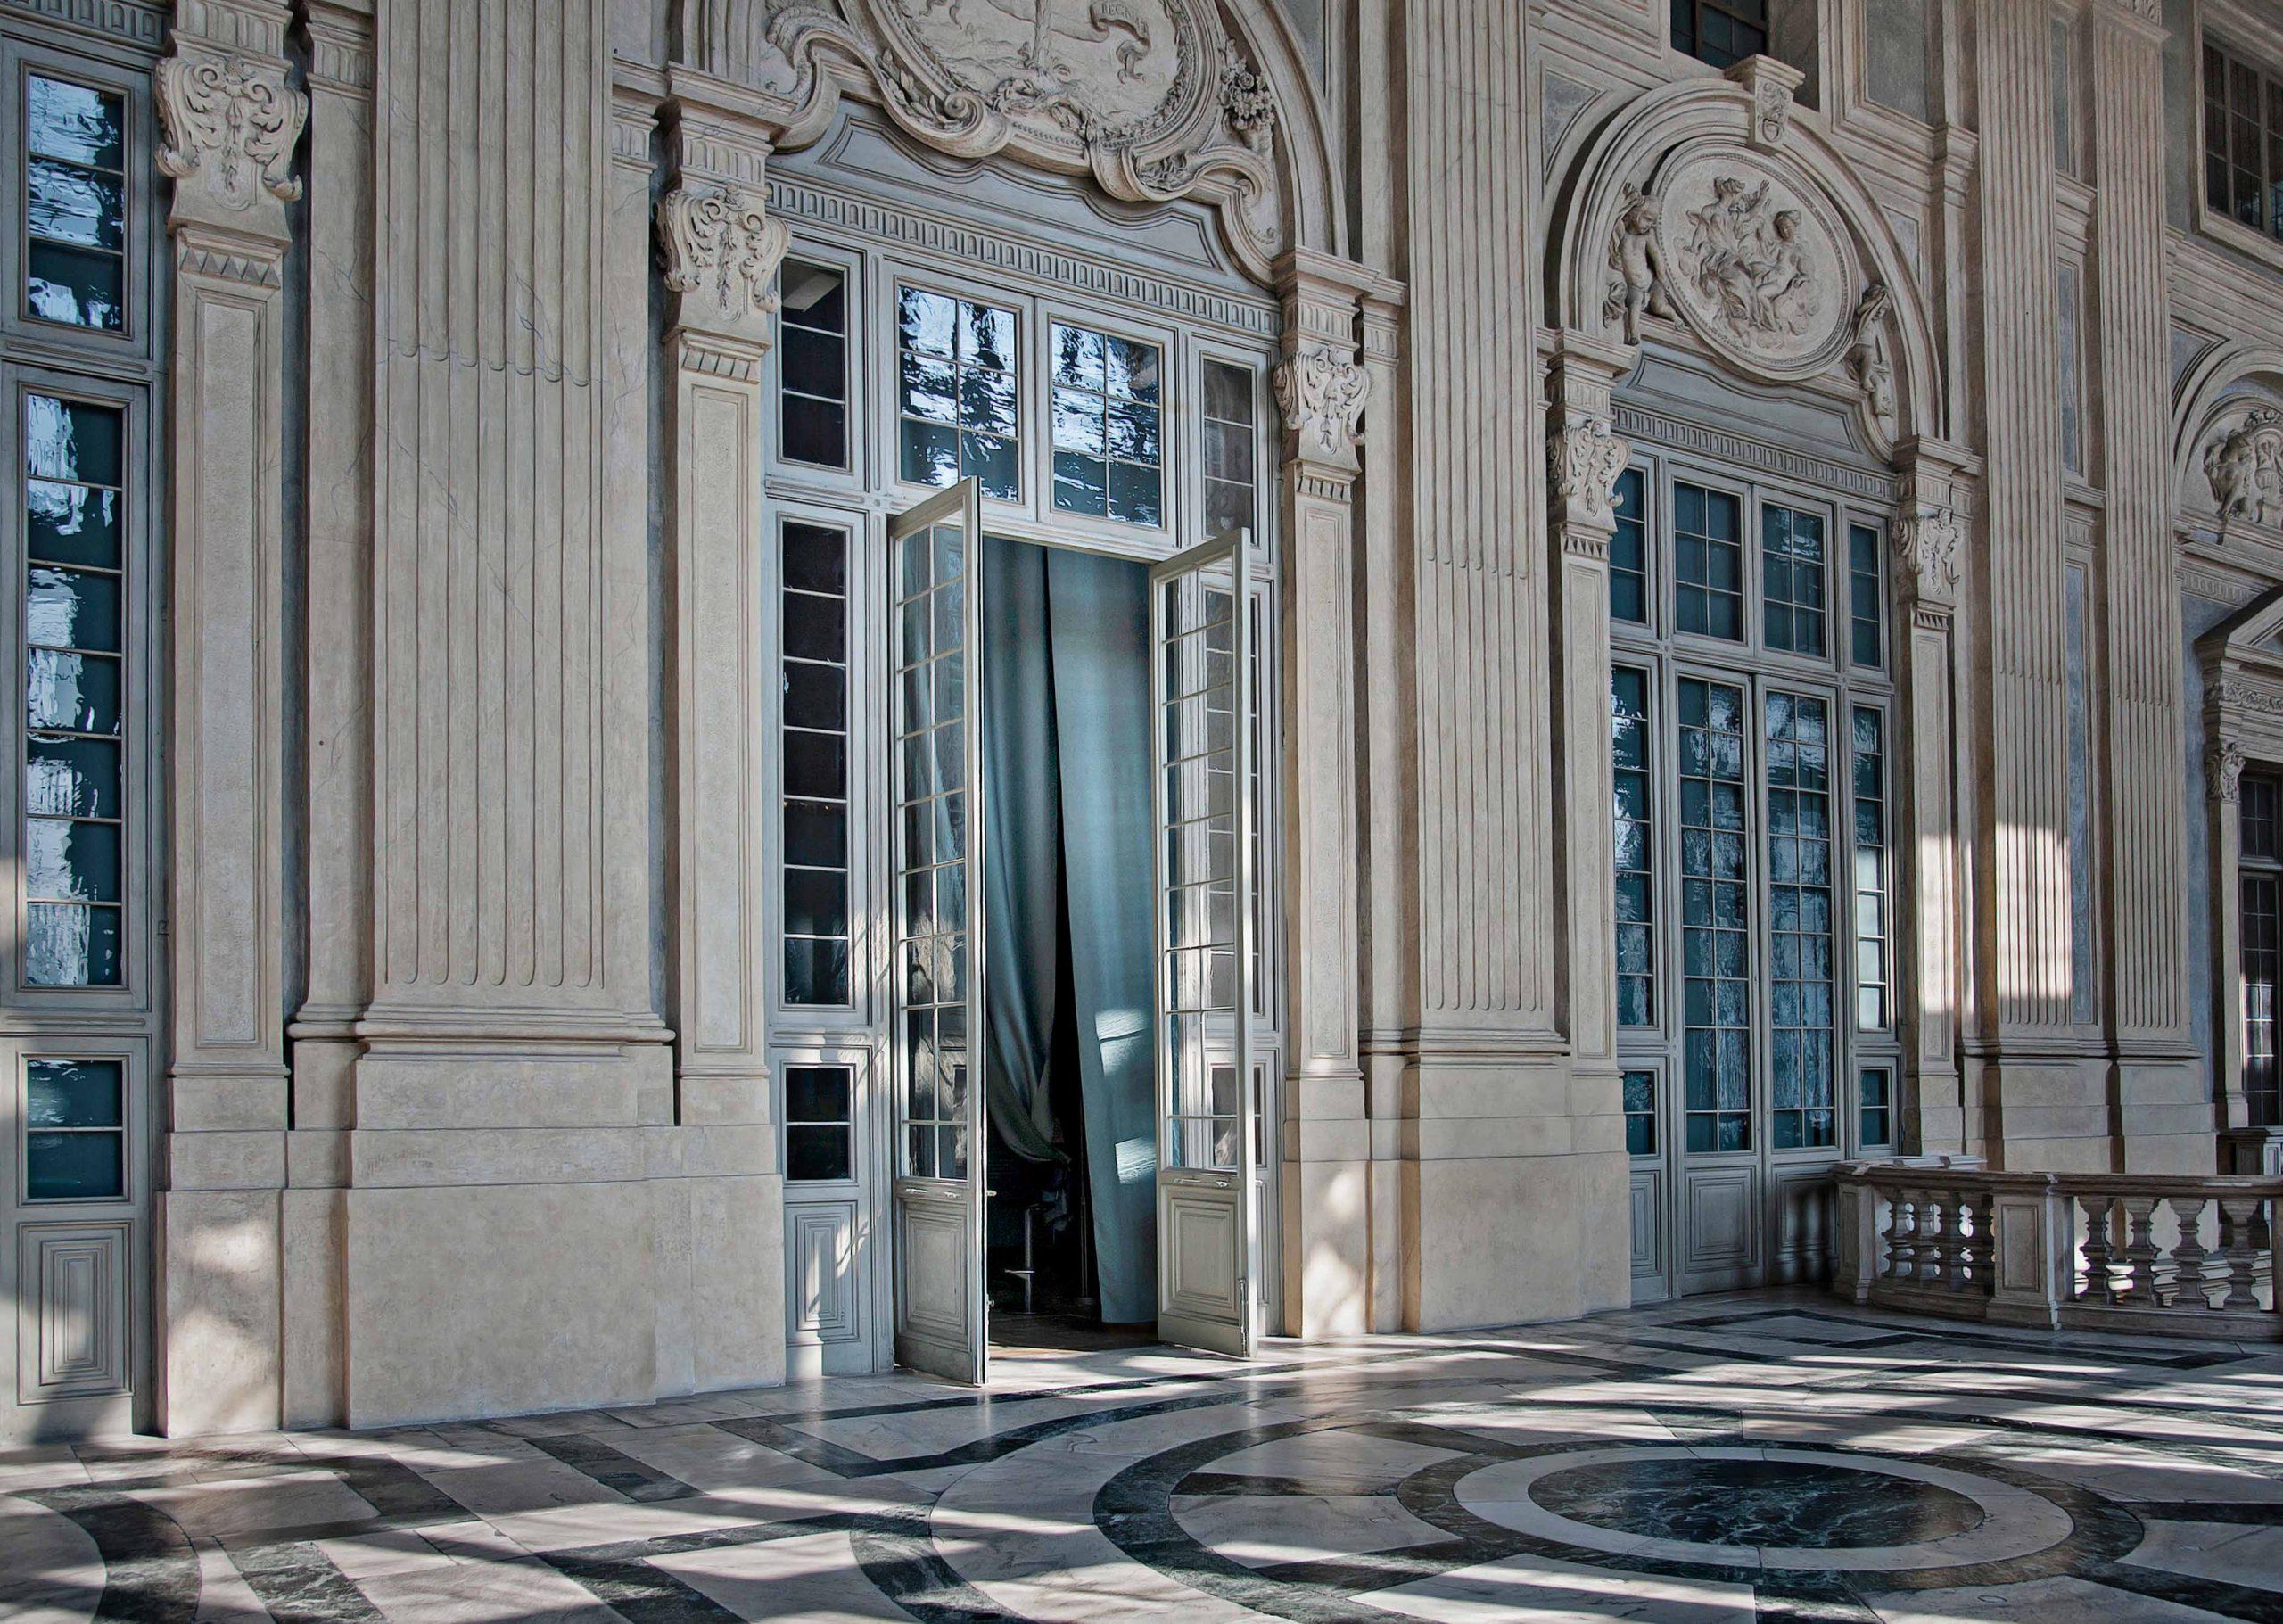 portes-pivotantes-en-bois-charnieres-invisibles-de-fritsjurgens-palazzo-madamme-scaled.jpg